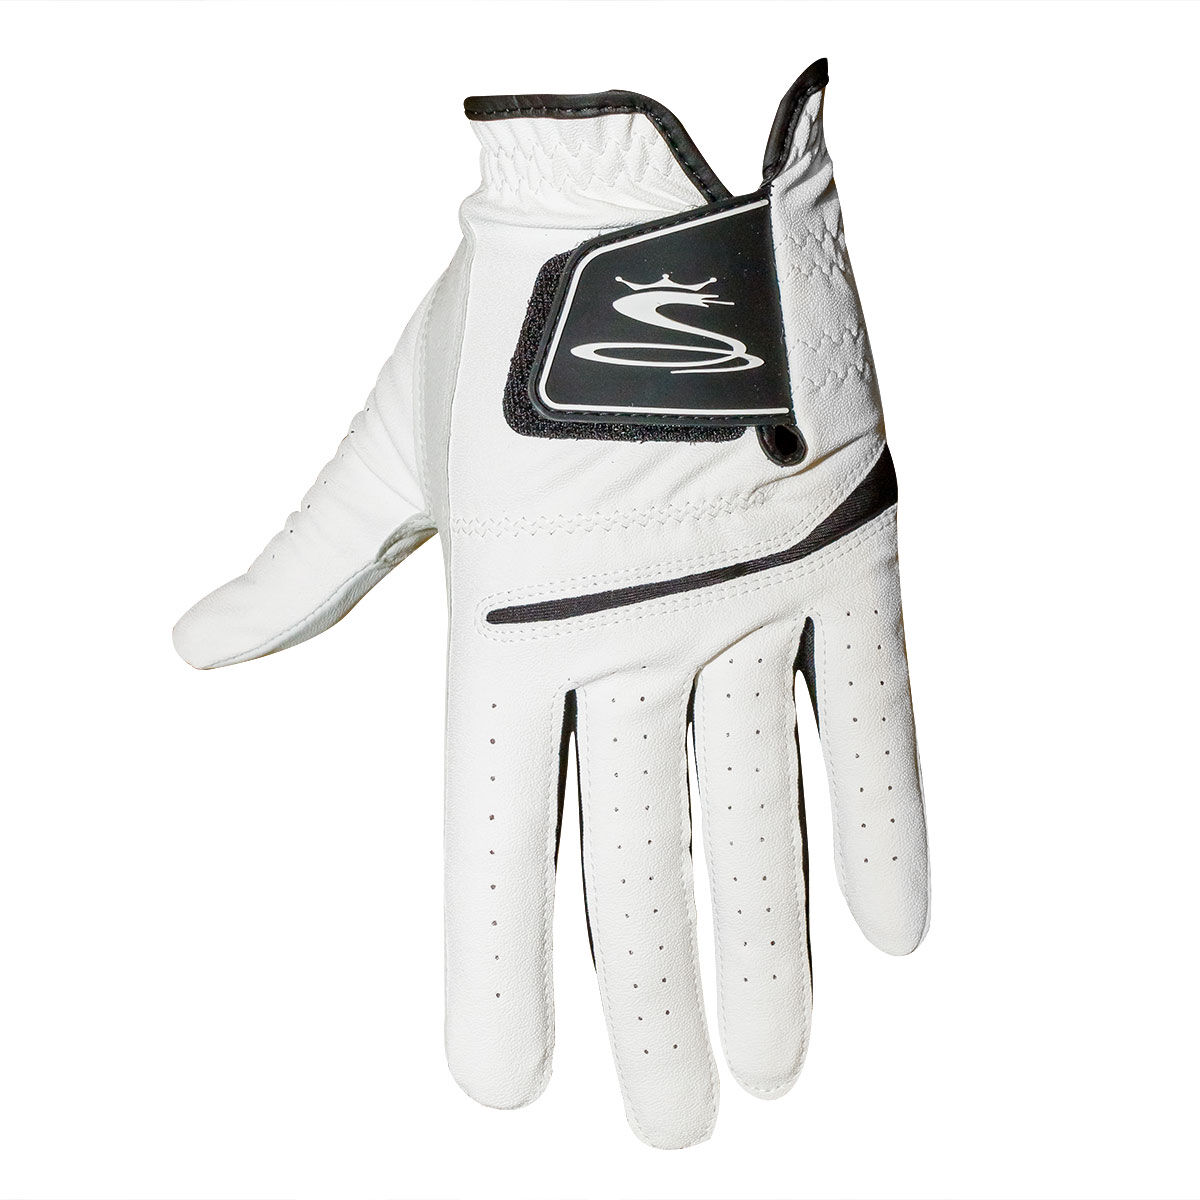 Cobra Golf Flex Cell Golf Glove, Mens, Left hand, Large, White   American Golf